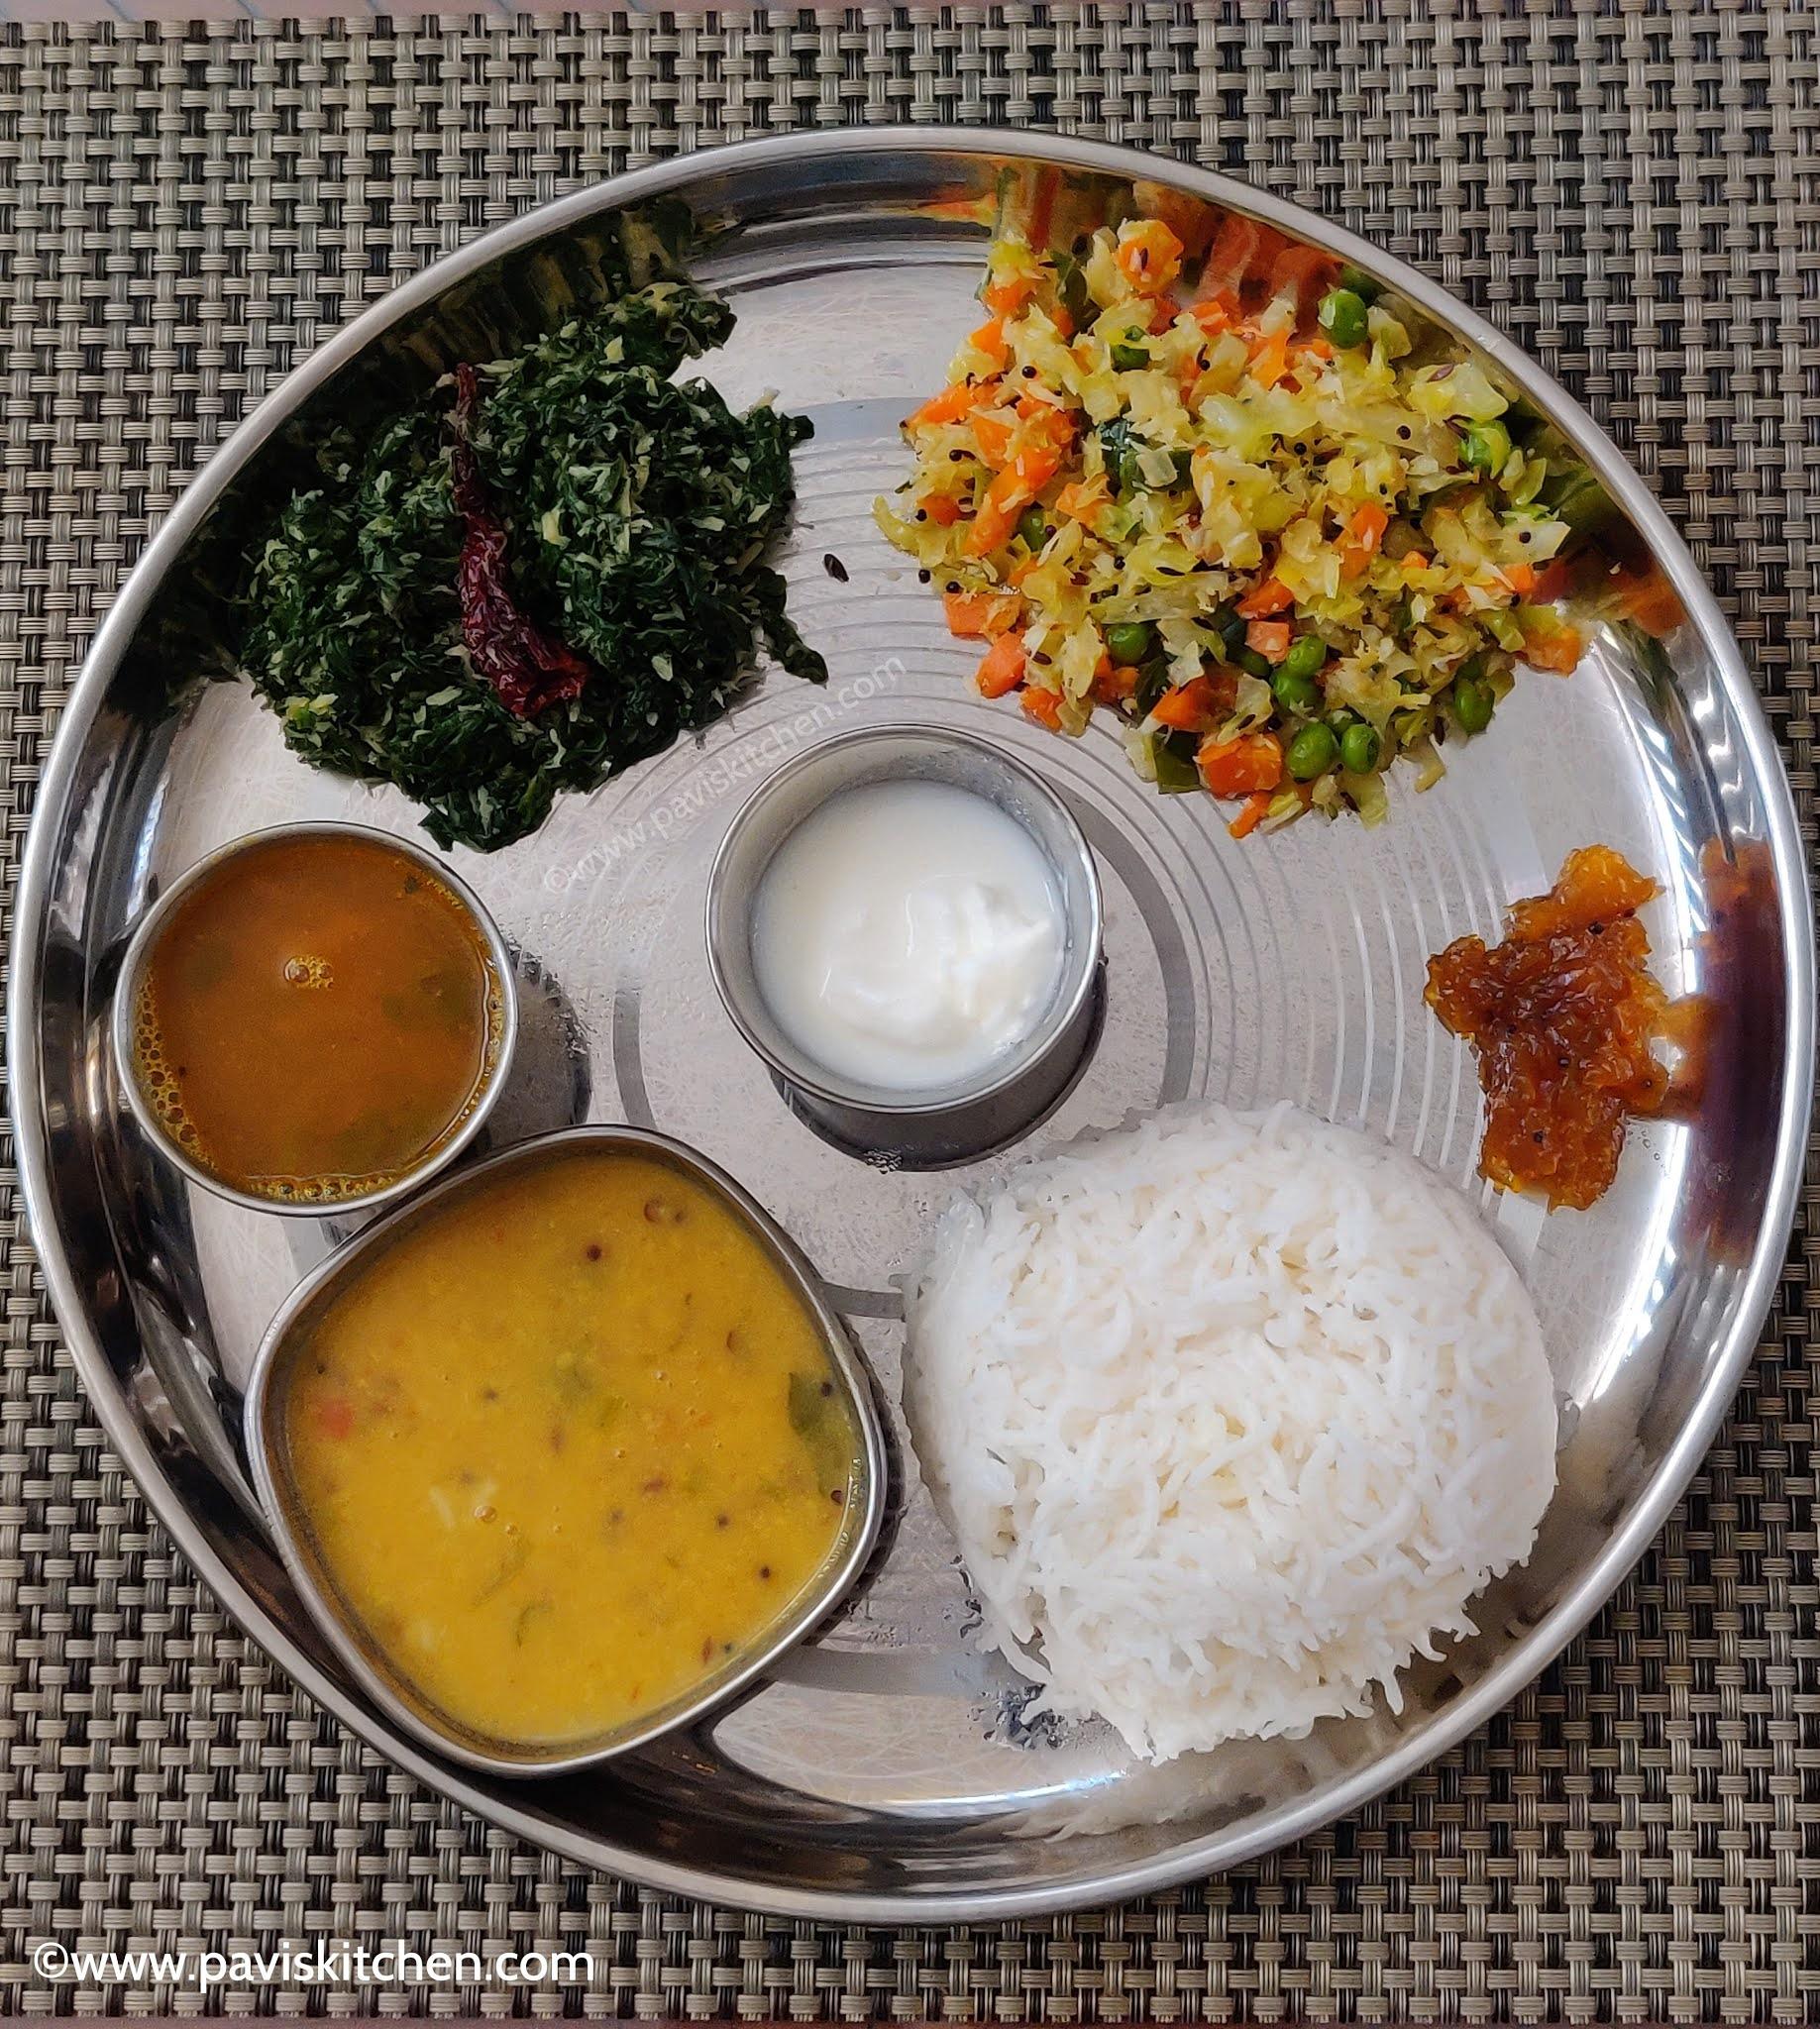 South Indian thali recipe | Indian vegetarian thali recipe | Lunch menu ideas